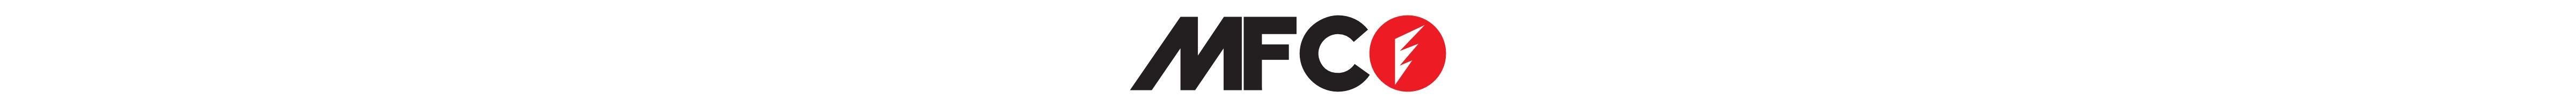 LogoLitesFinnenxMPwaqKLyUfOs